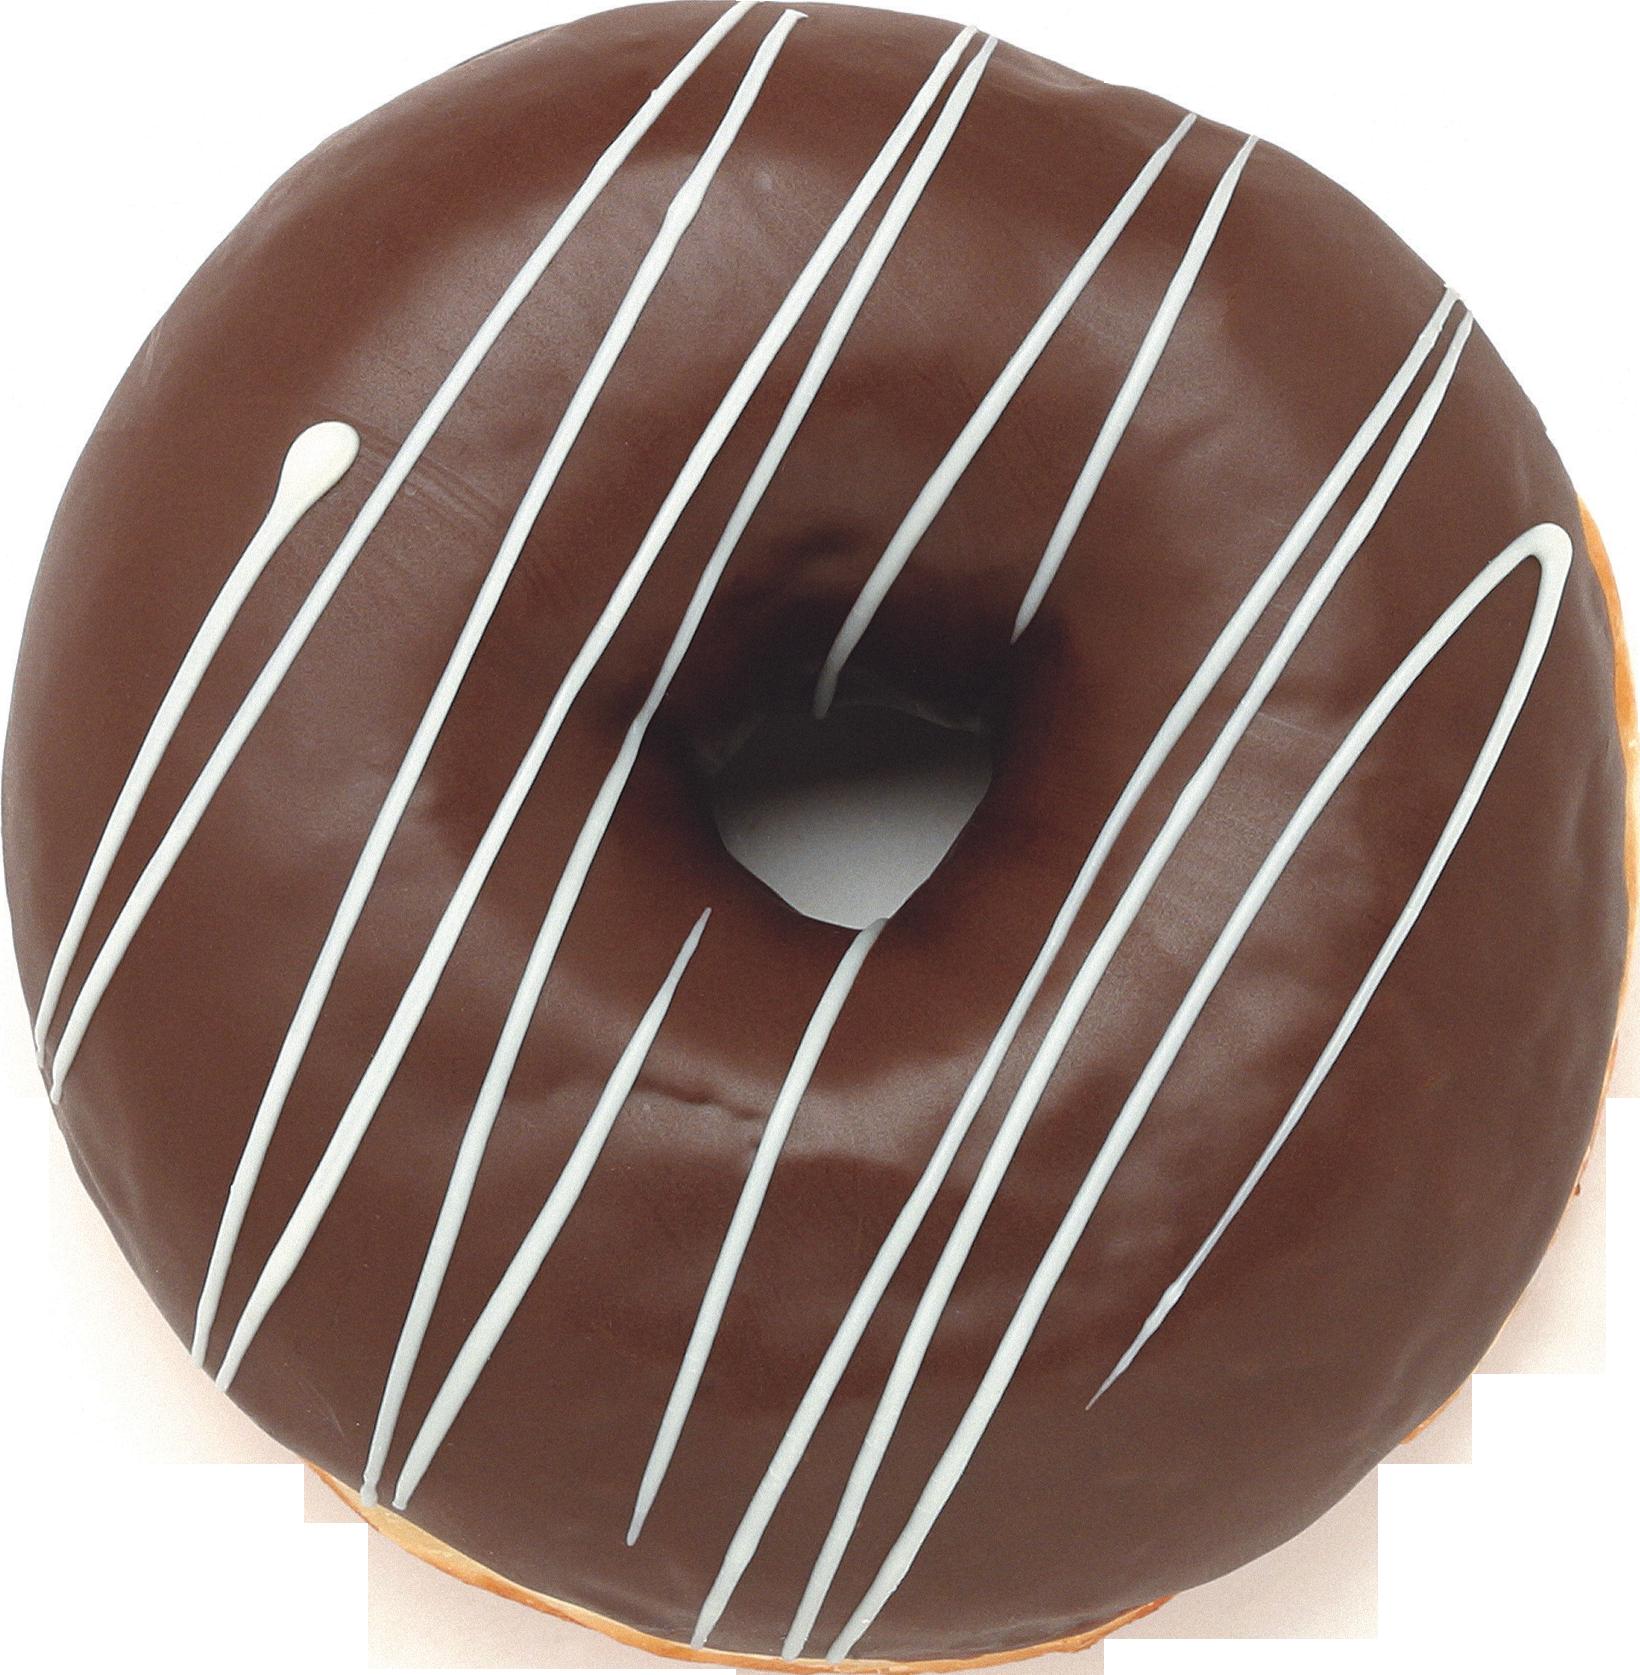 Donut PNG Image - PurePNG | Free transparent CC0 PNG Image ...